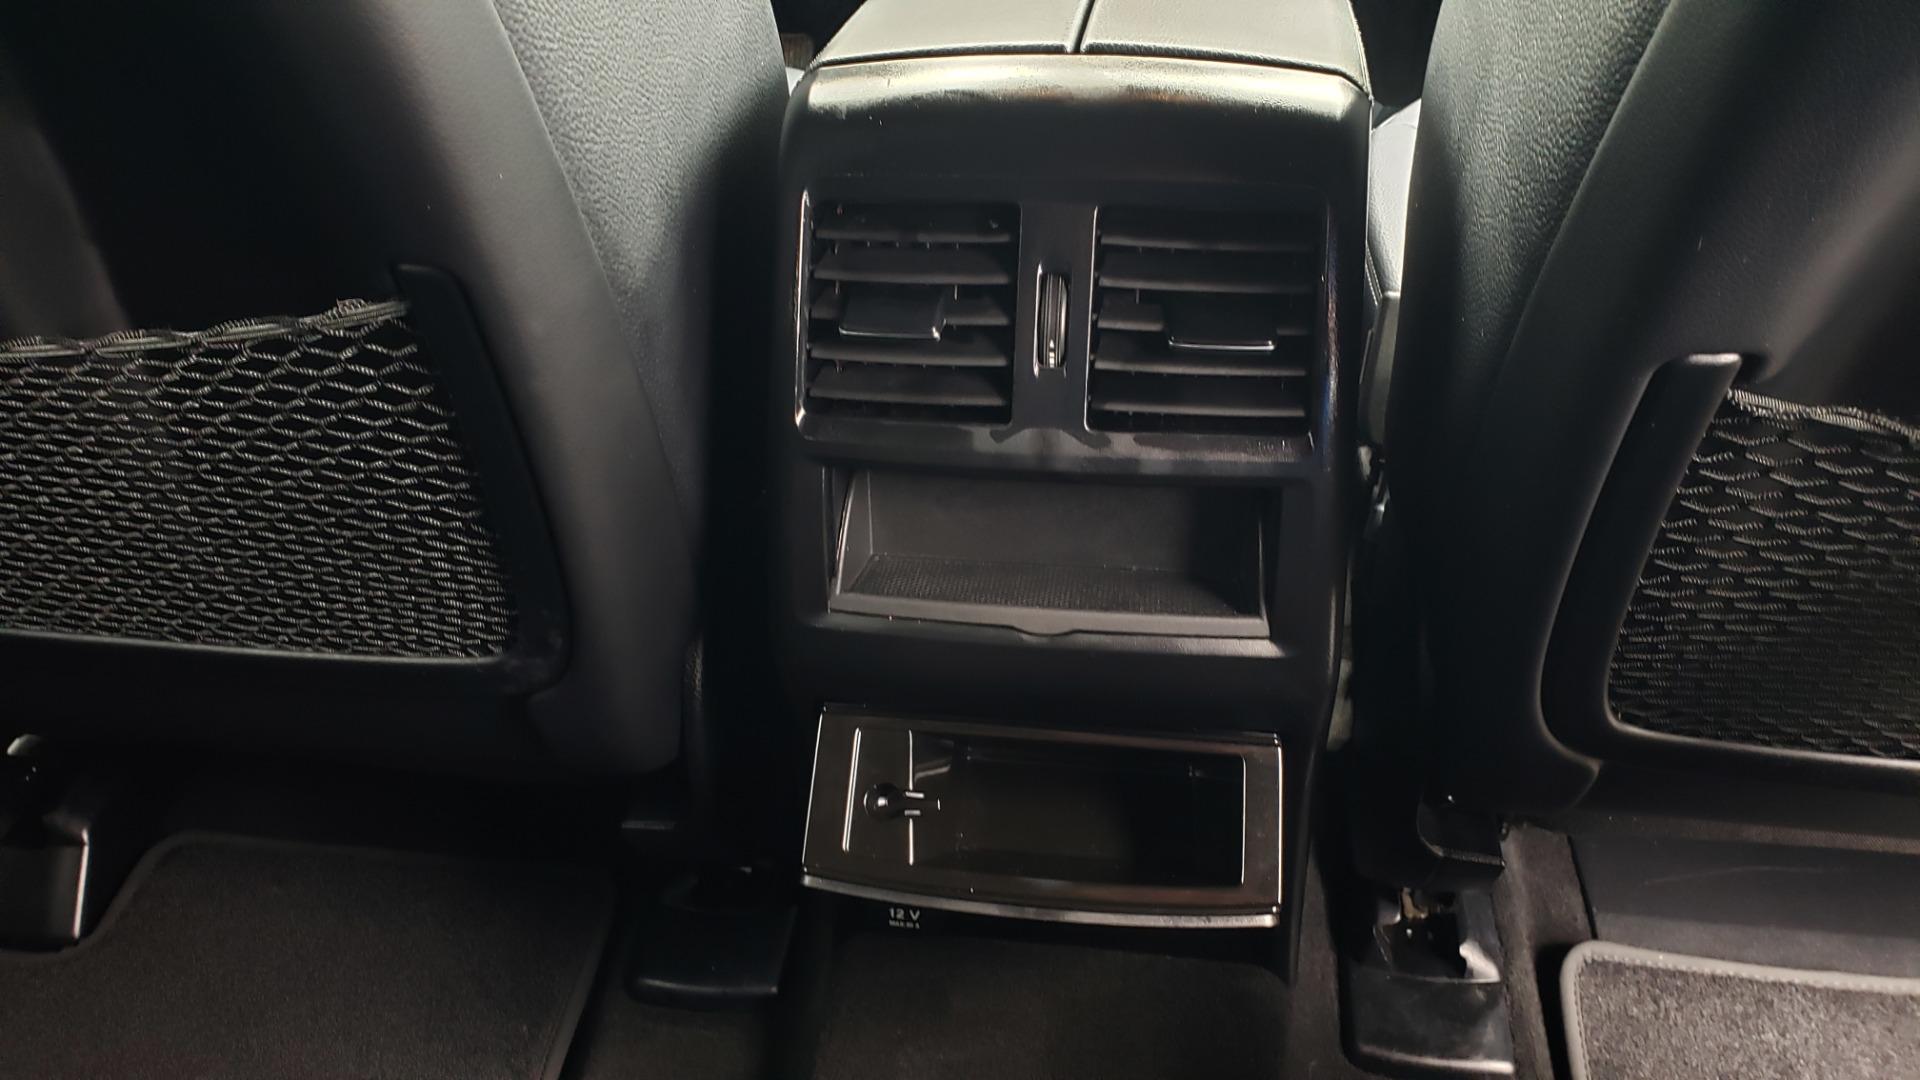 Used 2018 Mercedes-Benz GLE 350 4MATIC / PREM PKG / NAV / PARK ASST / K/H SND / HITCH / REARVIEW for sale $40,801 at Formula Imports in Charlotte NC 28227 80